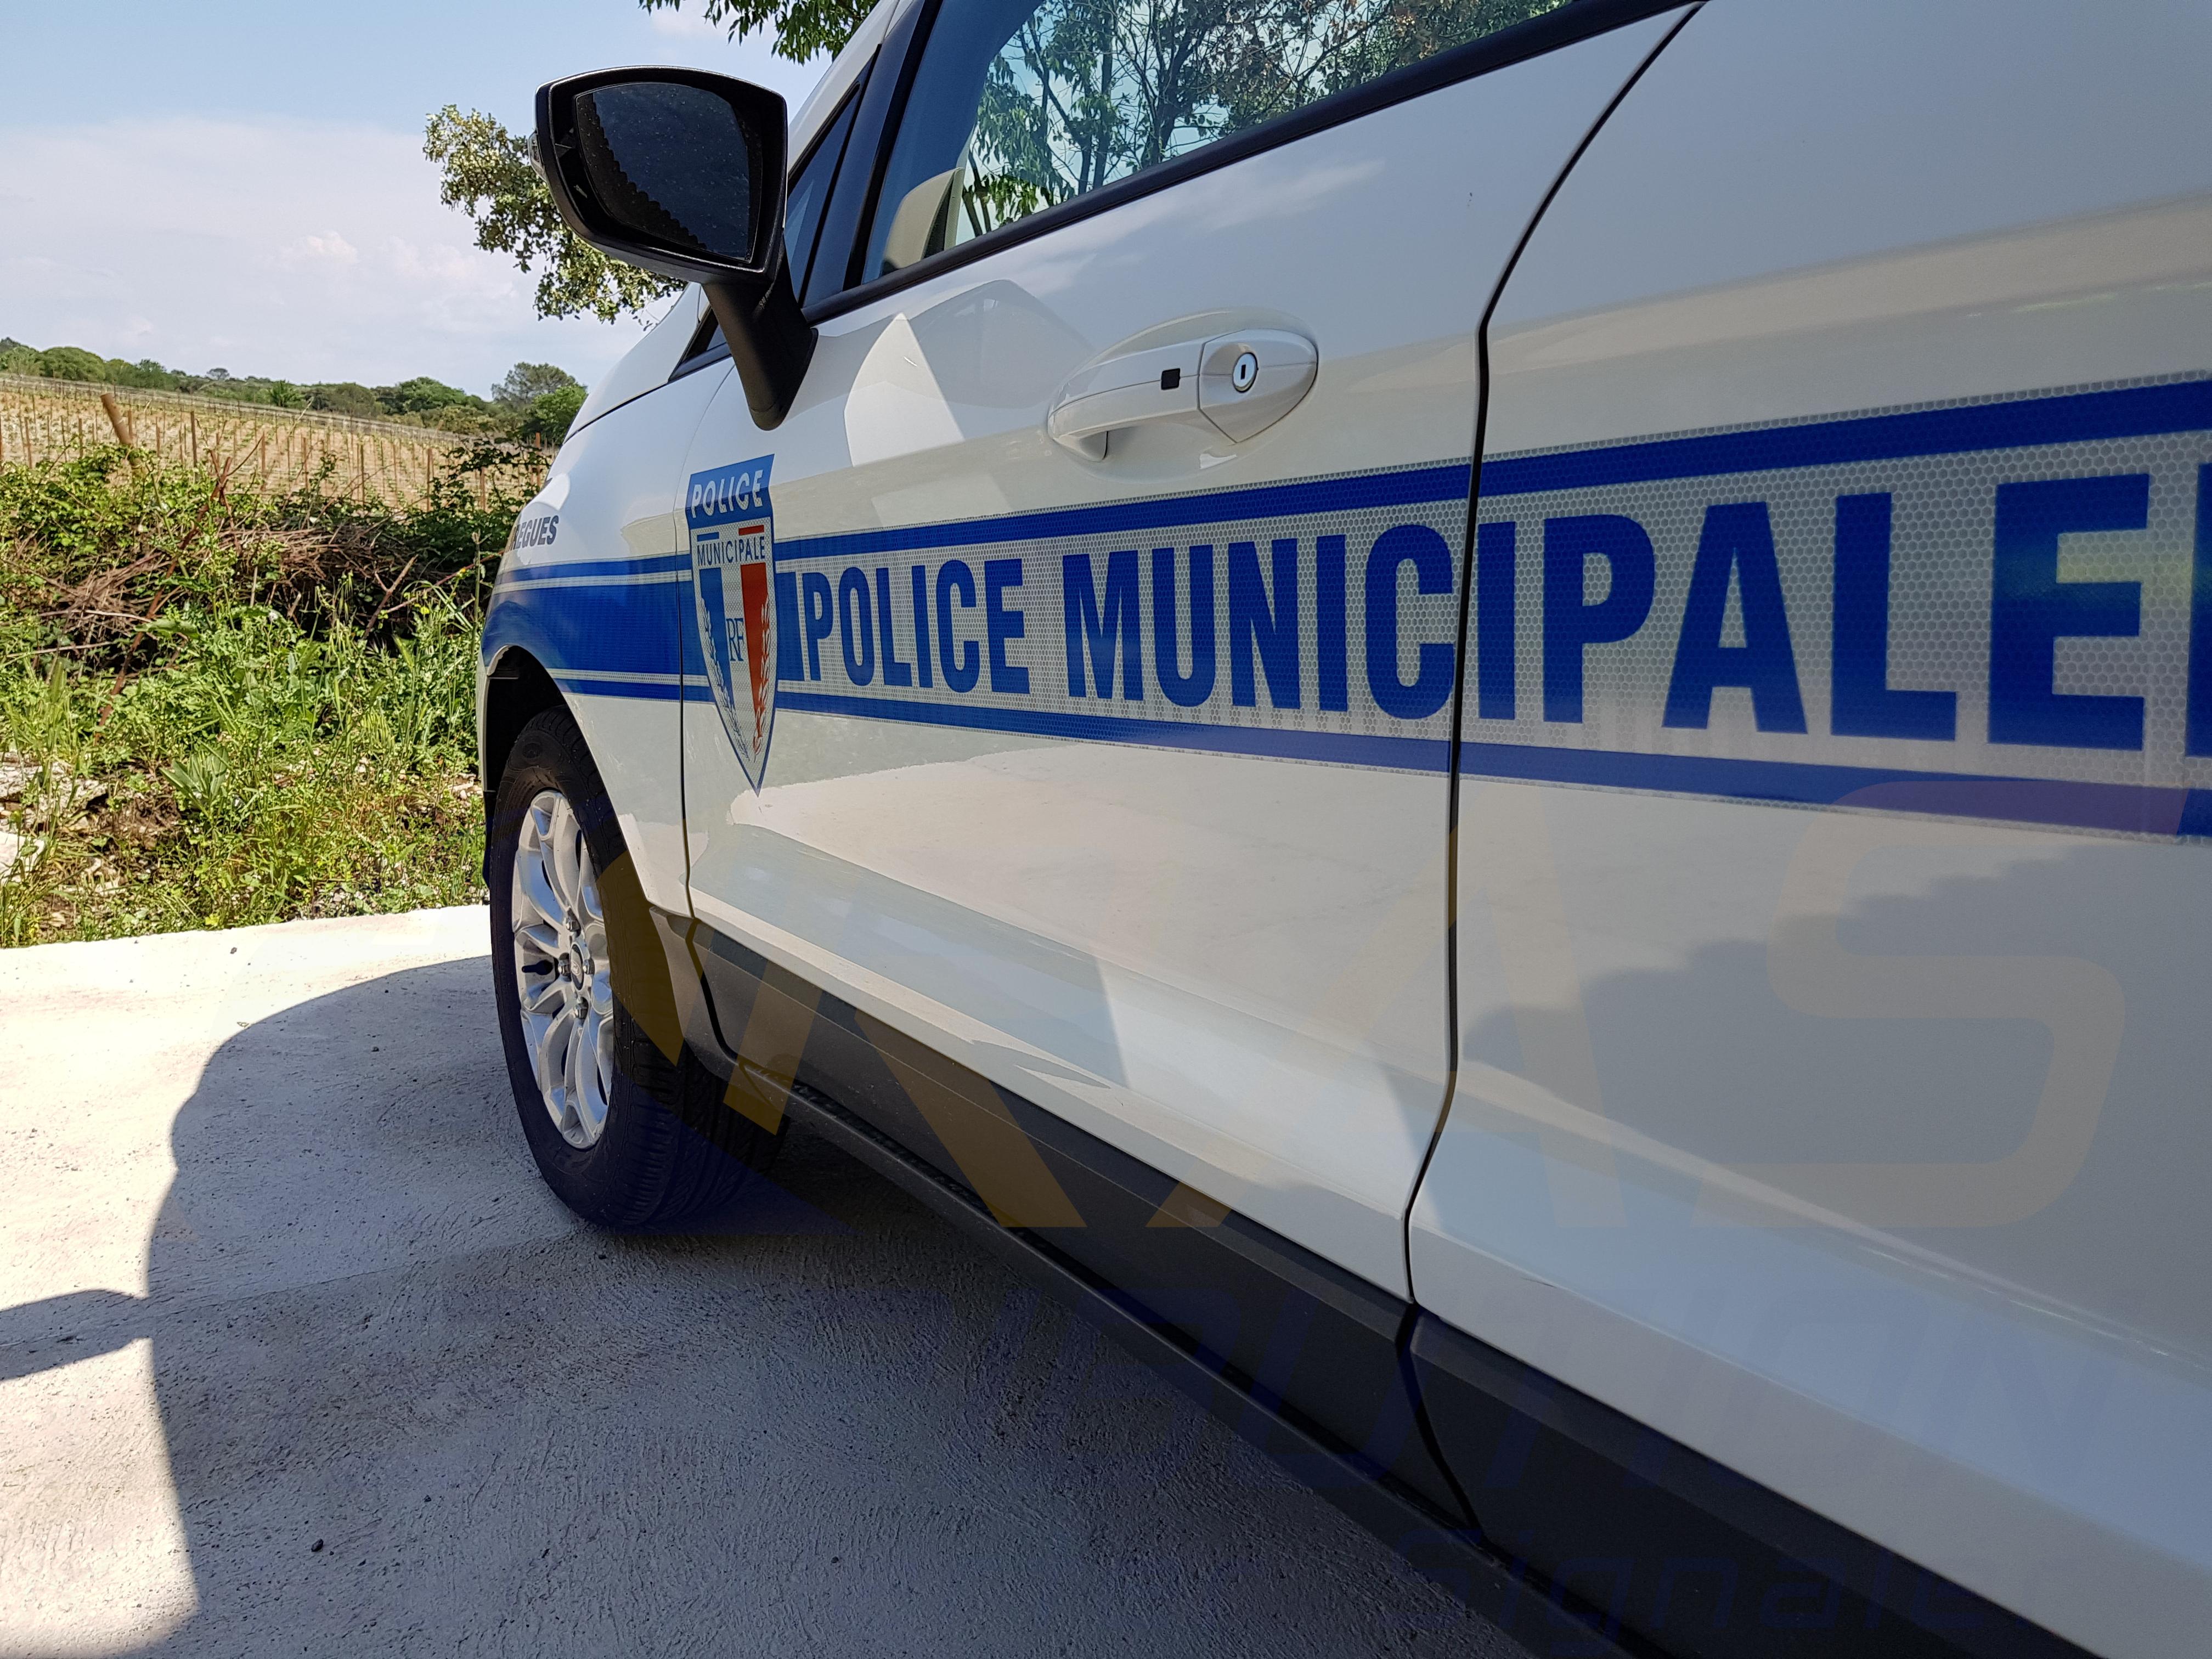 Sérigraphie Police Municipale Montpellier RAS DISTRIBUTION